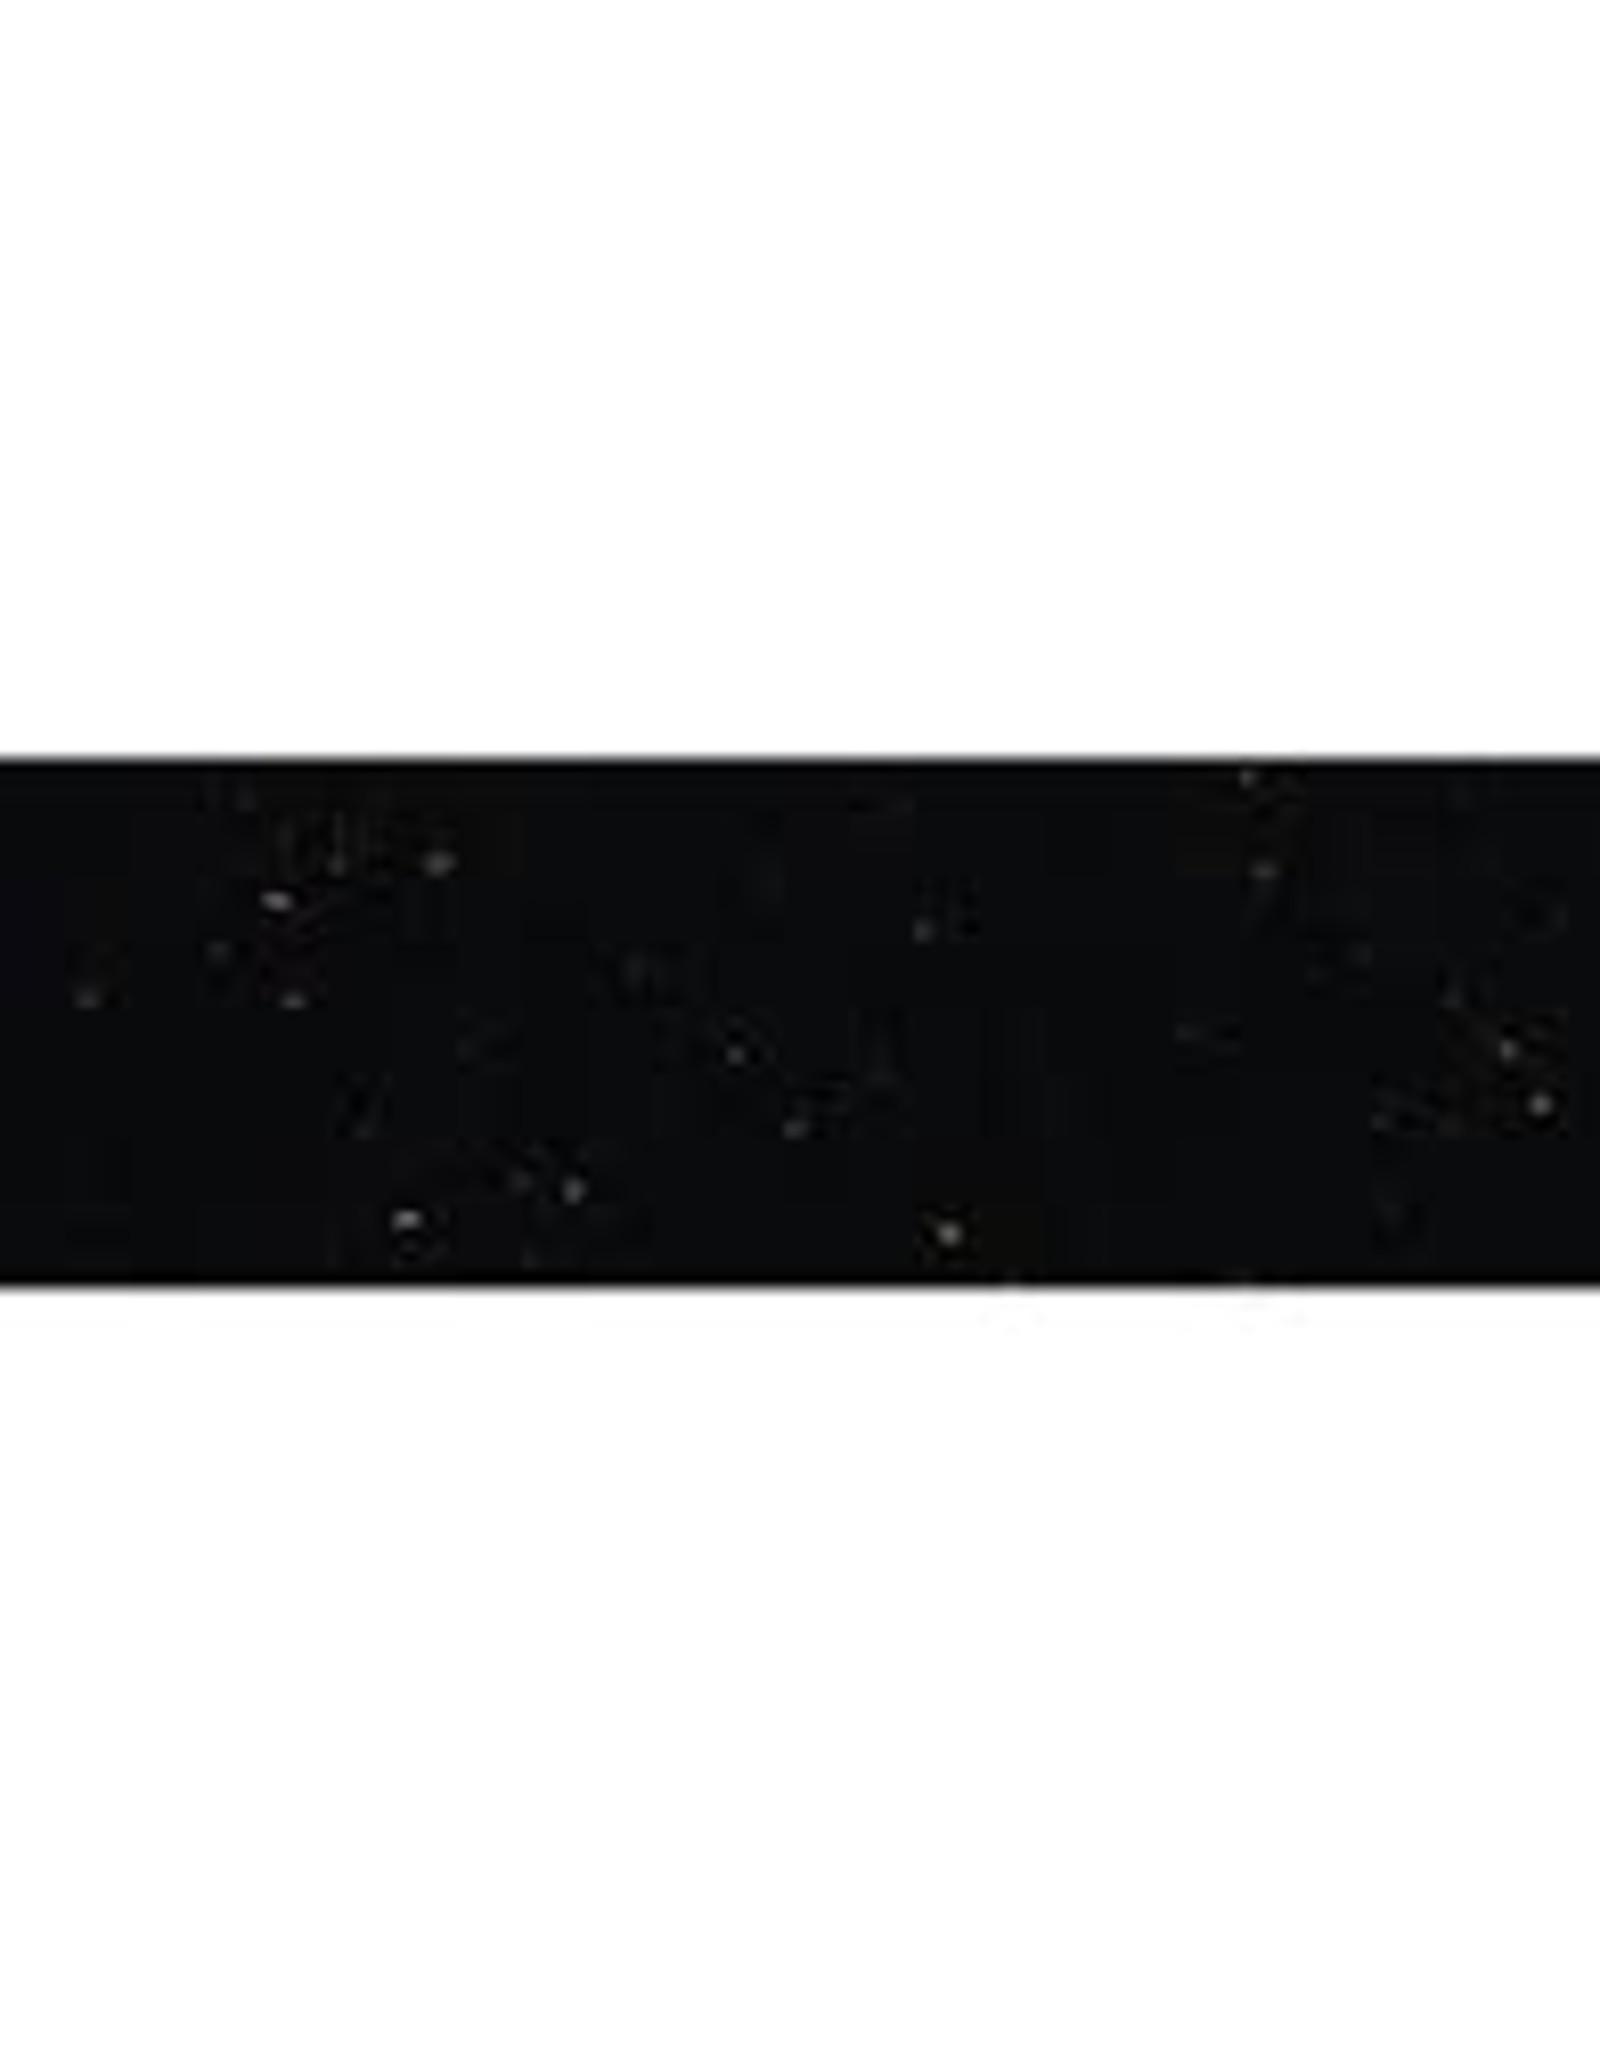 Serfas Bar Tape Serfas Cork Road W/Adhesive - Black